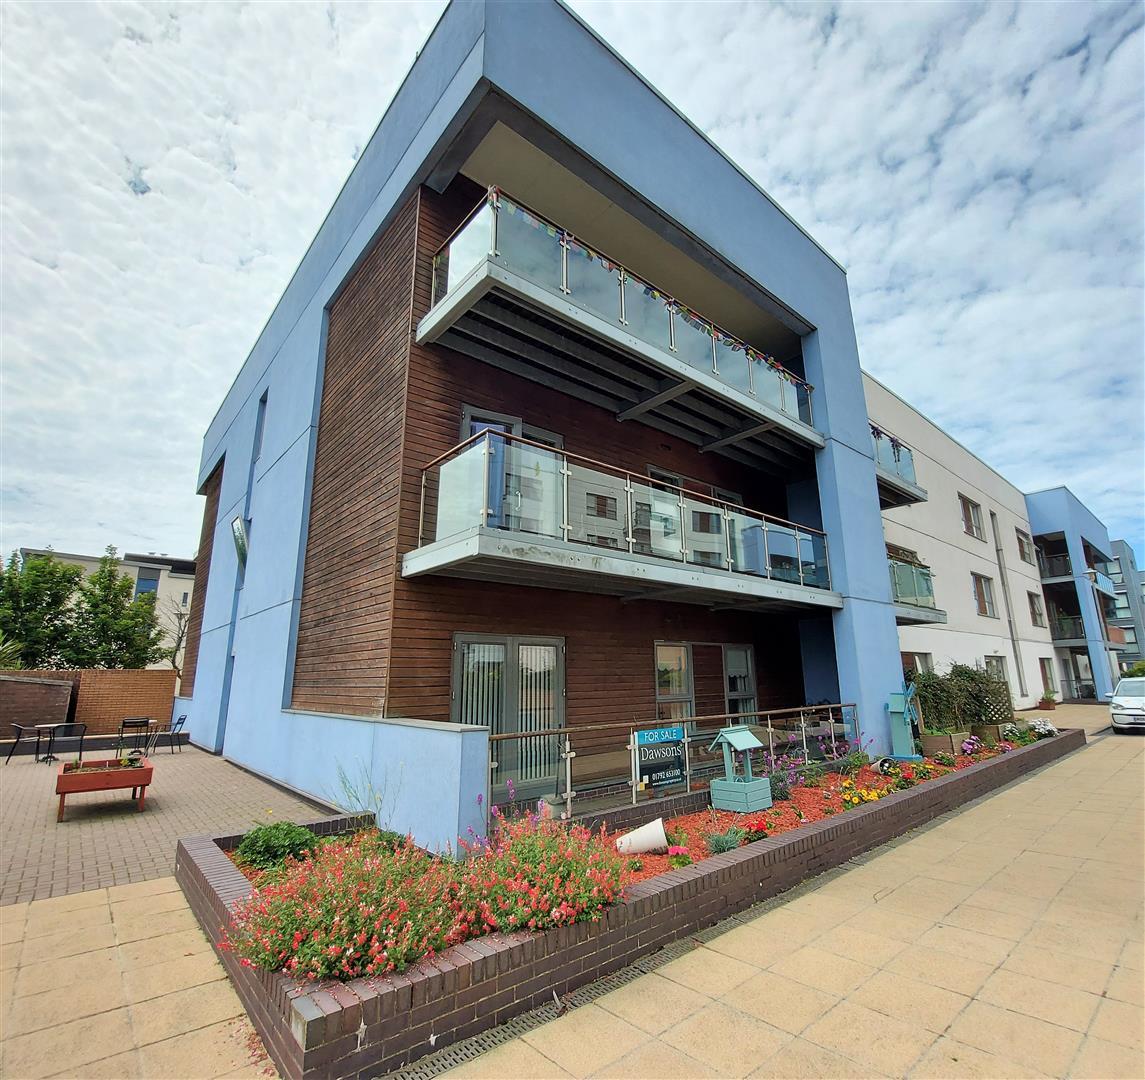 Mariners Court, Lamberts Road, Marina, Swansea, SA1 8QS